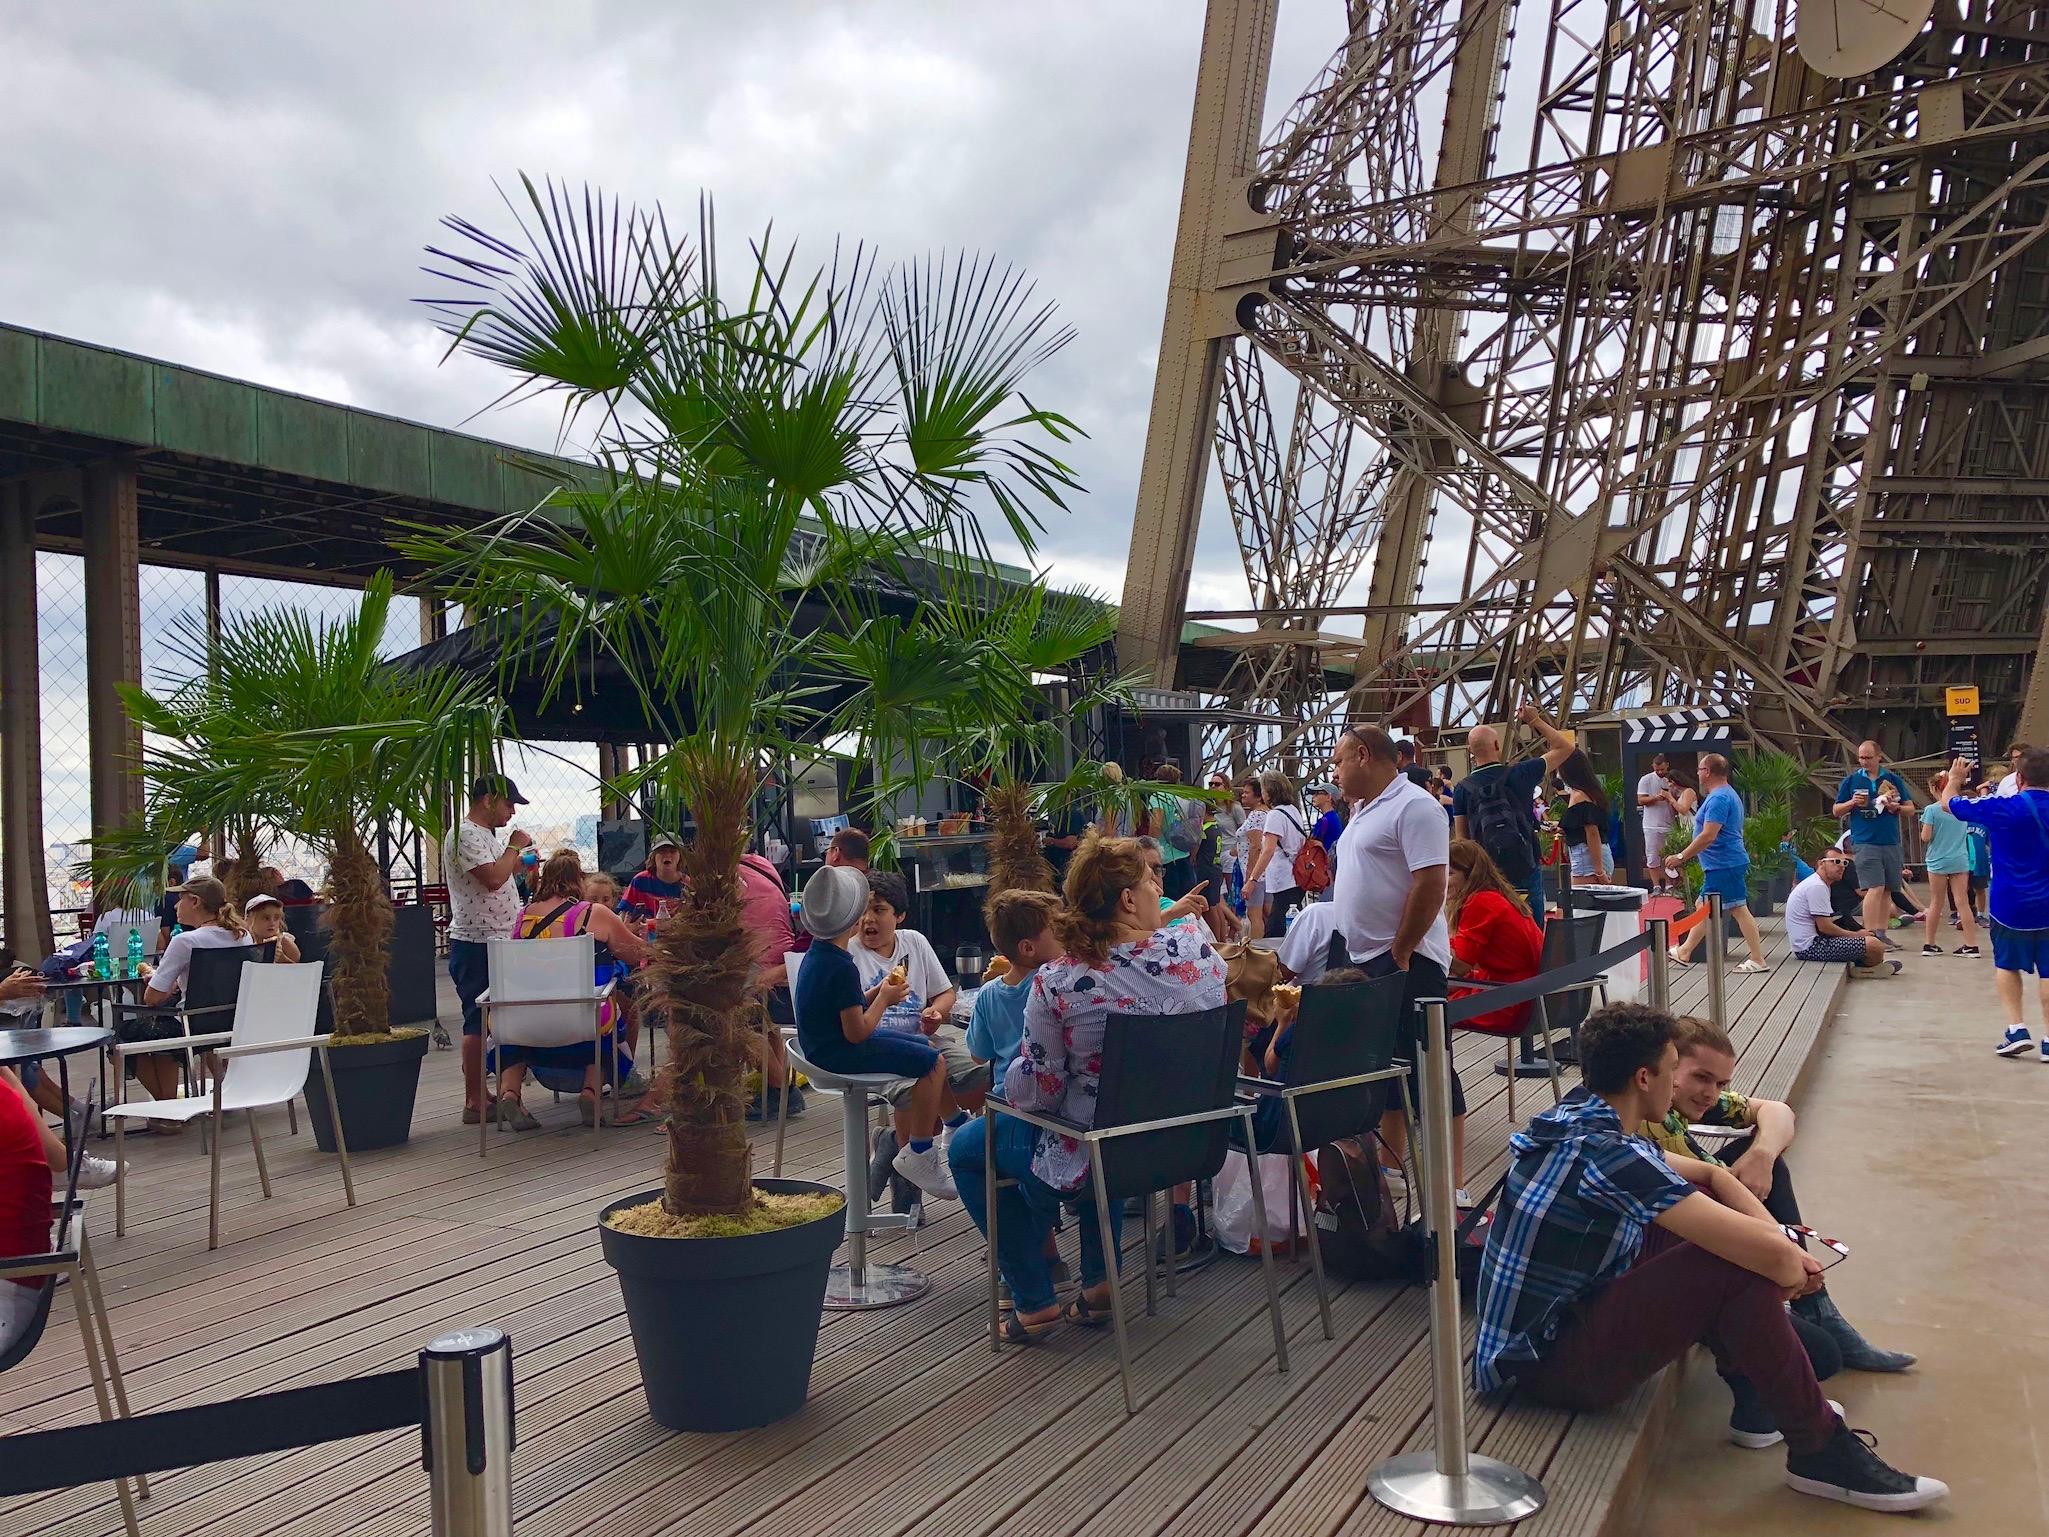 First floor café terrace, Eiffel Tower